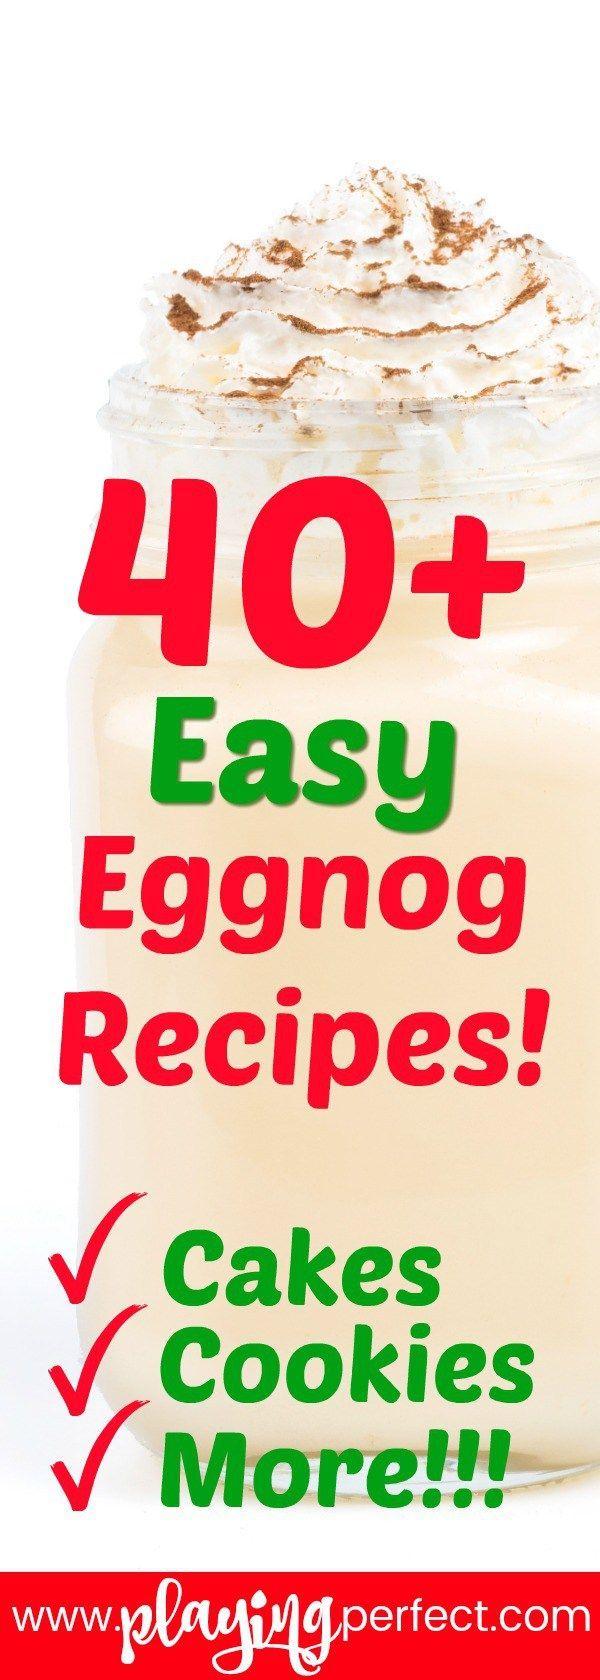 Eggnog time! Here are 43 eggnog recipes for you to try this holiday season! Eggnog cakes, eggnog cupcakes, eggnog ice cream, eggnog for breakfast, and eggnog for parties are all coming your way! Let's go all eggnog! FREE printable! | playingperfect.com | #recipes #eggnog #food #yum #foodrecipes #eggnogrecipes #desserts #breakfast #foodie #playingperfect #roundups #rounduprecipes #eat #makeit #momstuff #easyrecipes #comfortfood